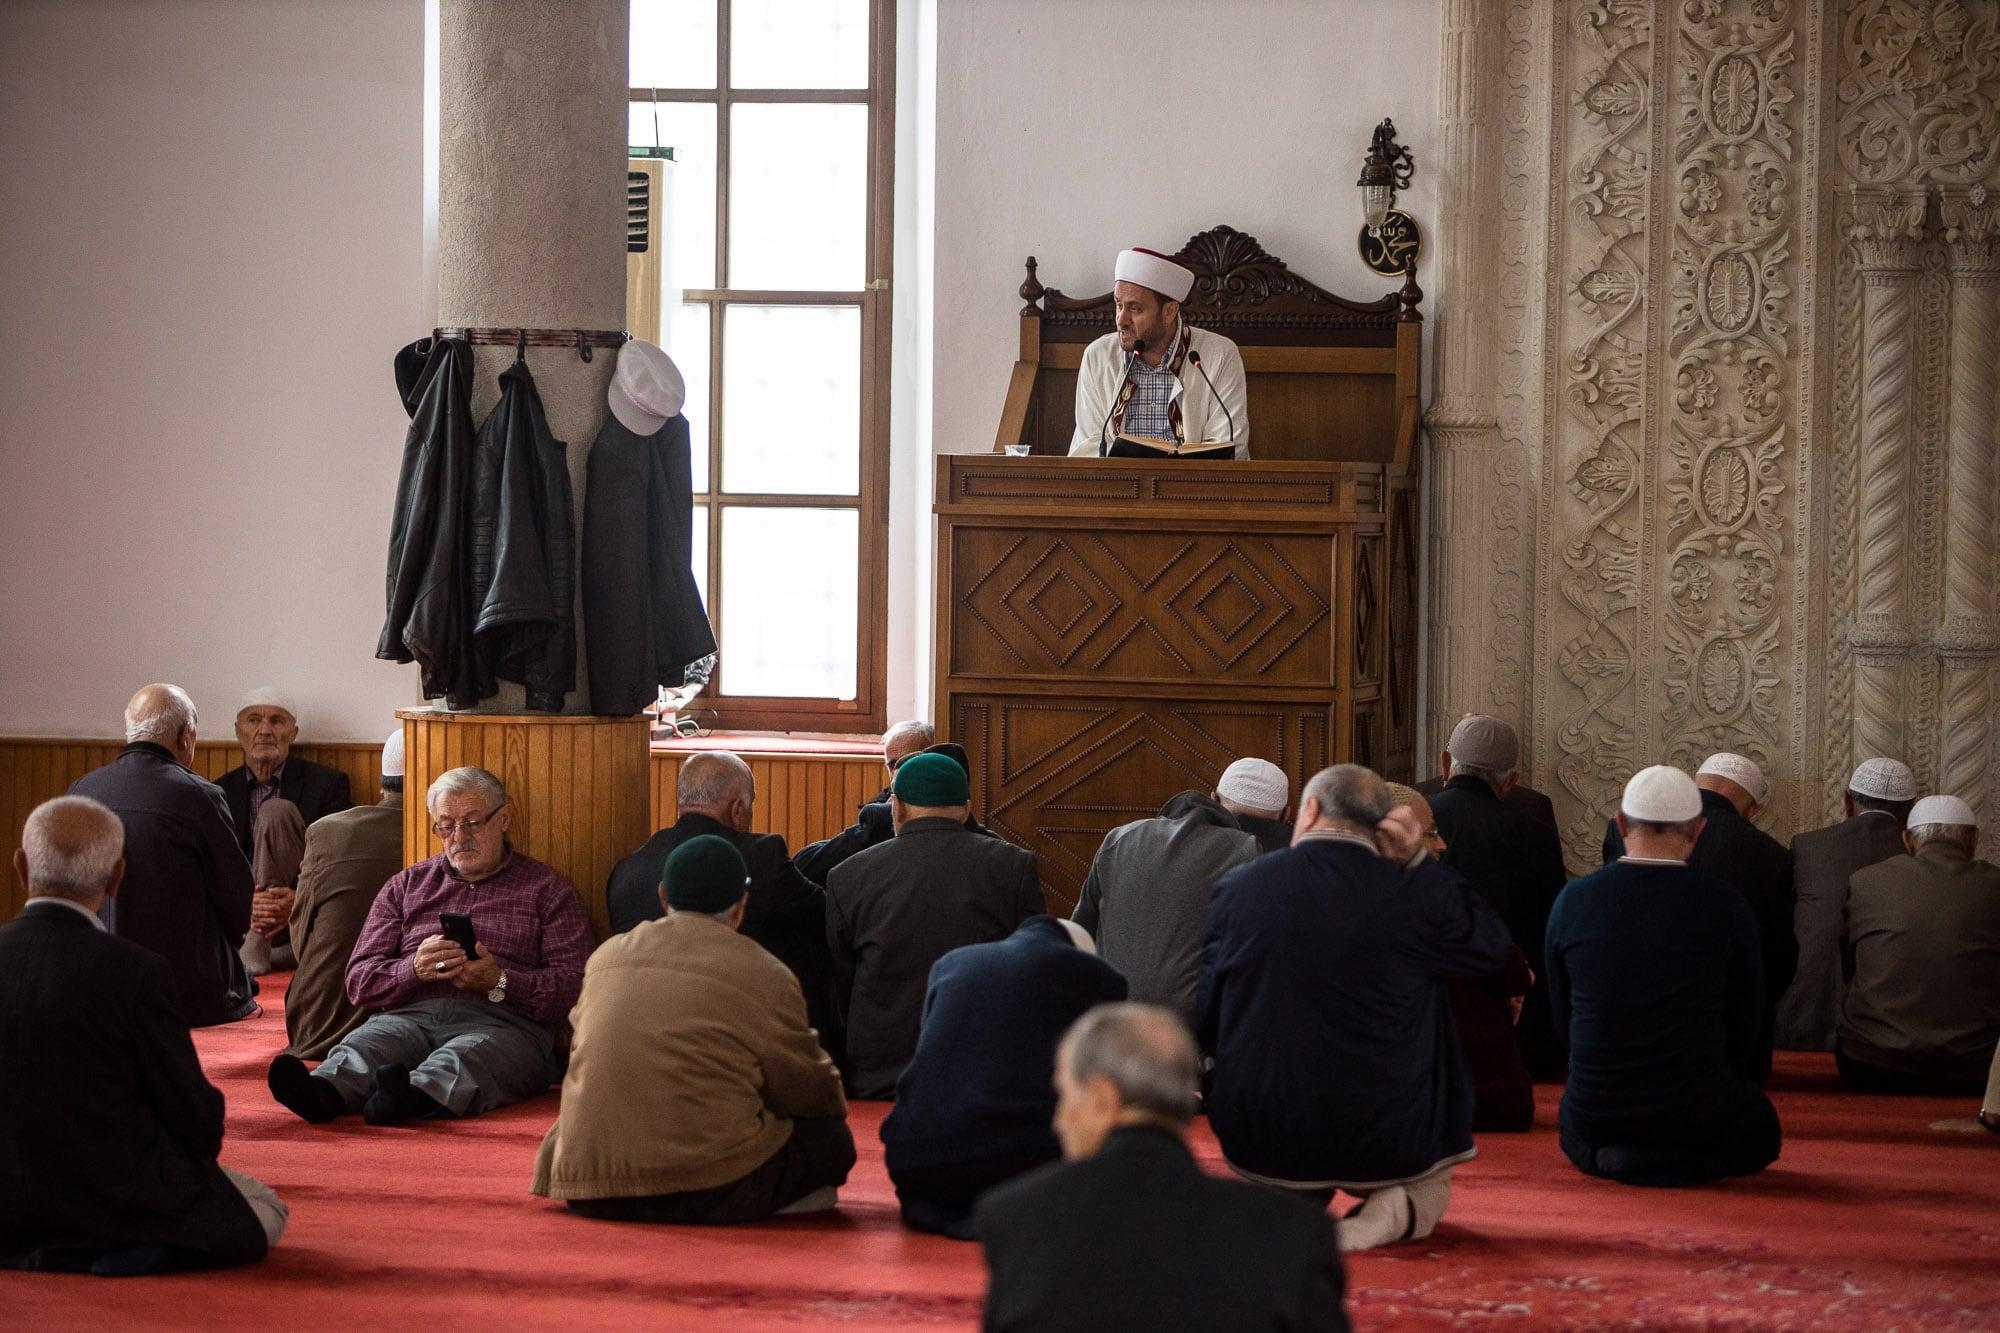 imam in Atik Ibrahim Pasa mosque